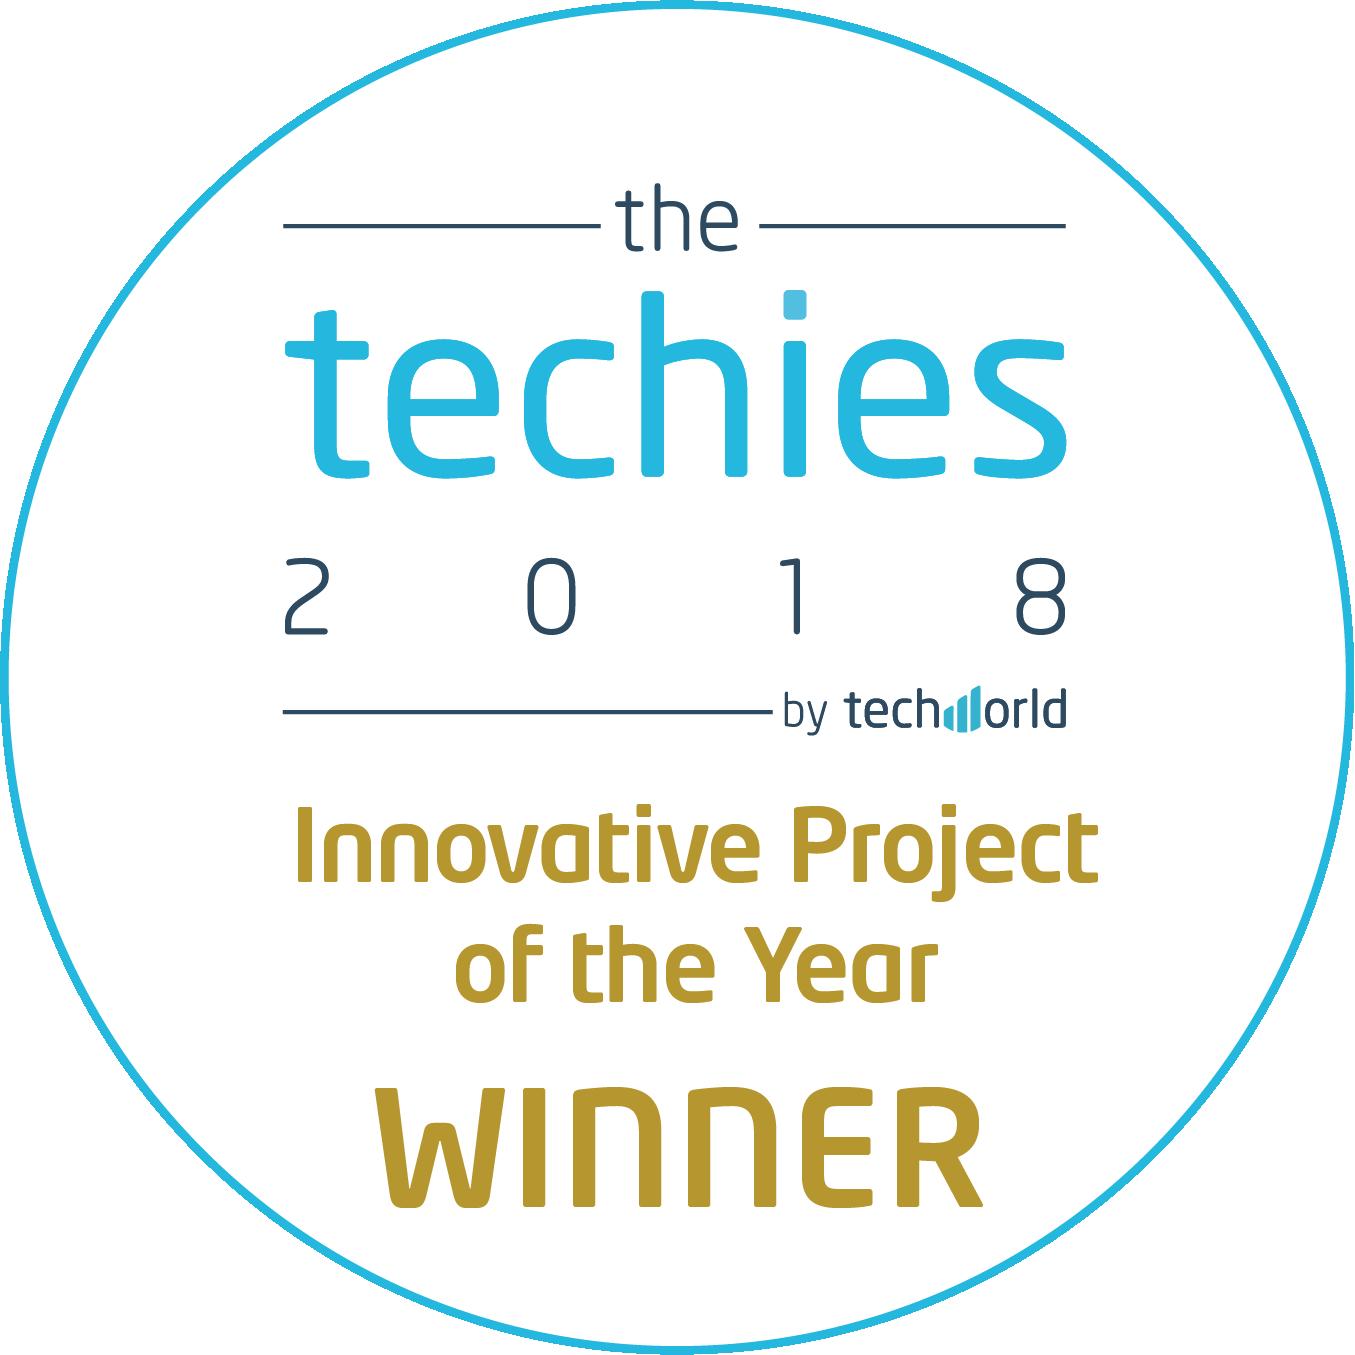 Techies 2018 Ancoris.png